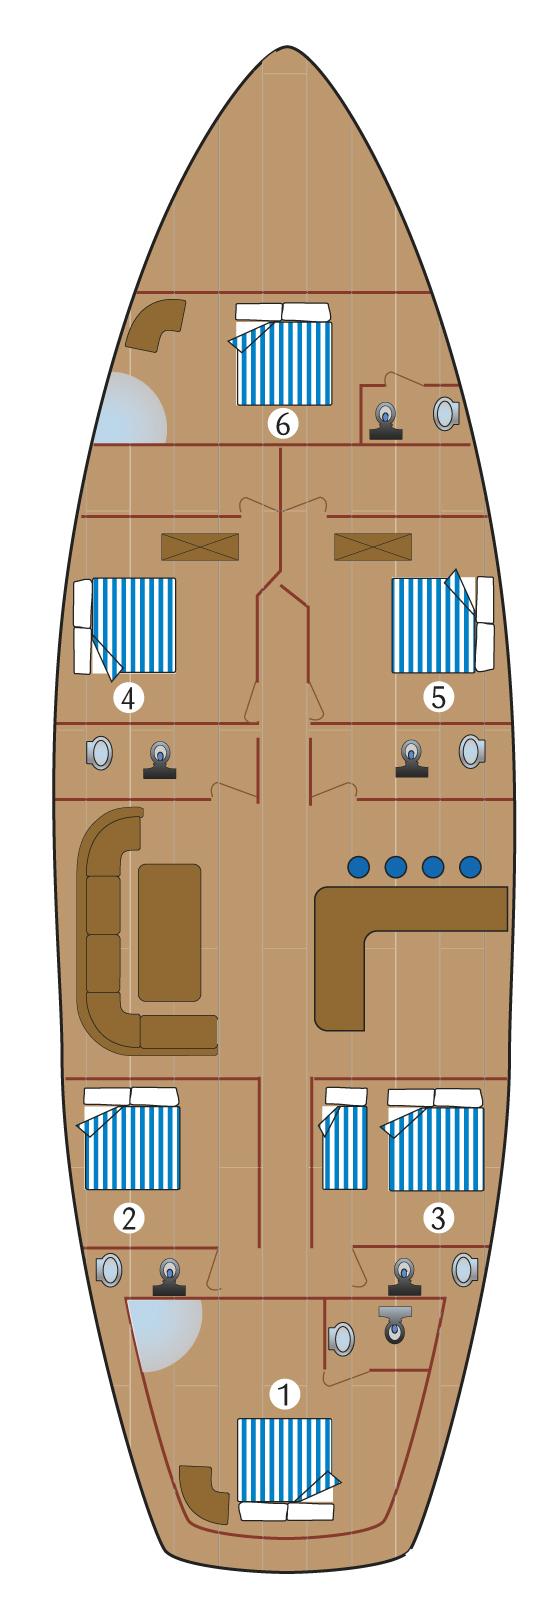 Babaveli-9-layout.jpg